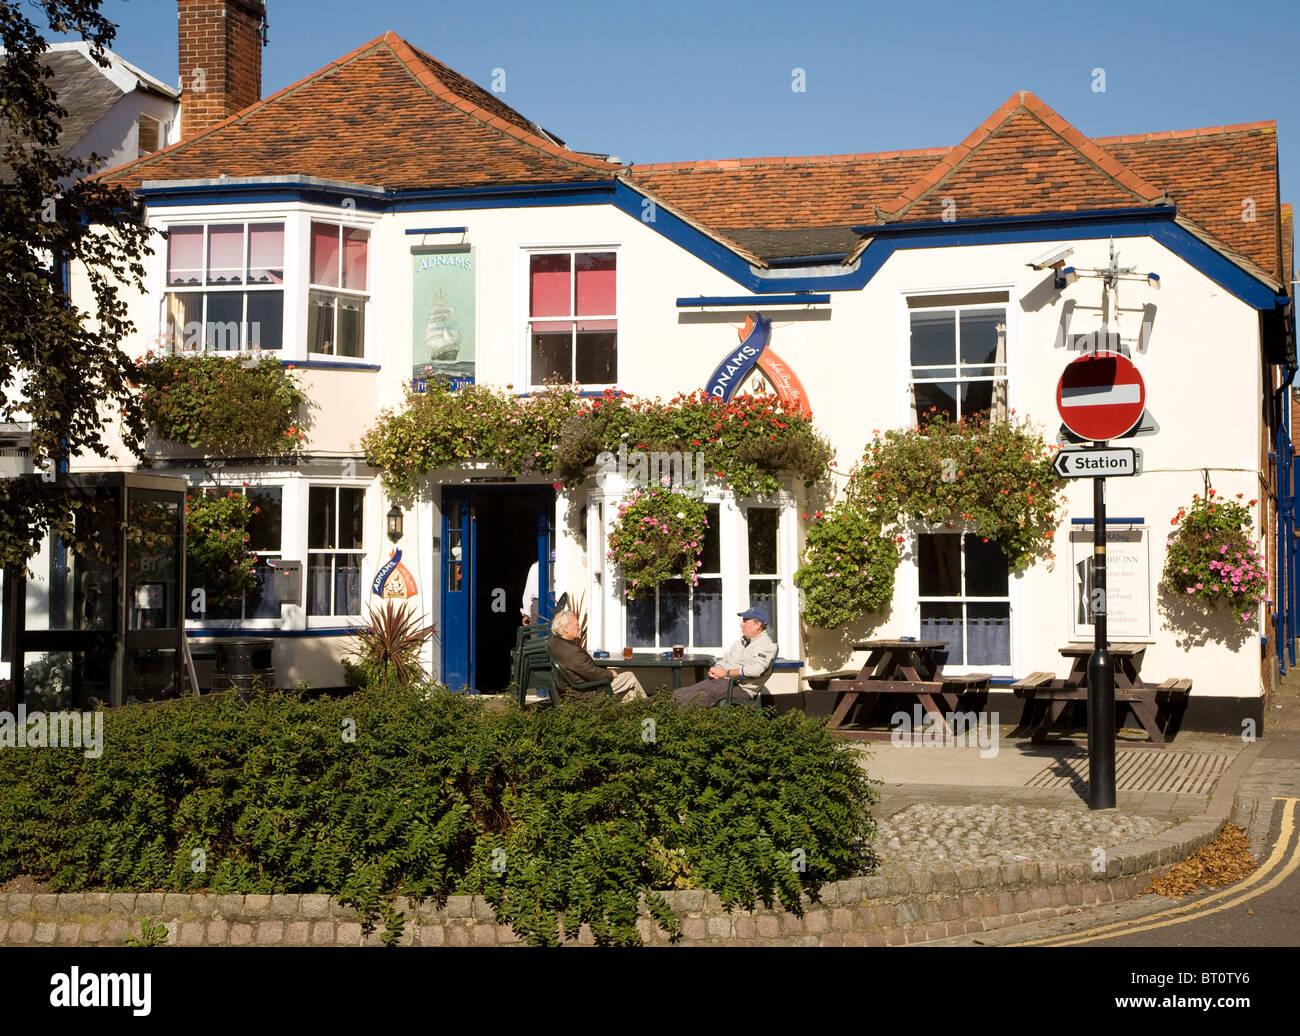 El Ship Inn pub Crouch Burnham en Essex, Inglaterra Imagen De Stock